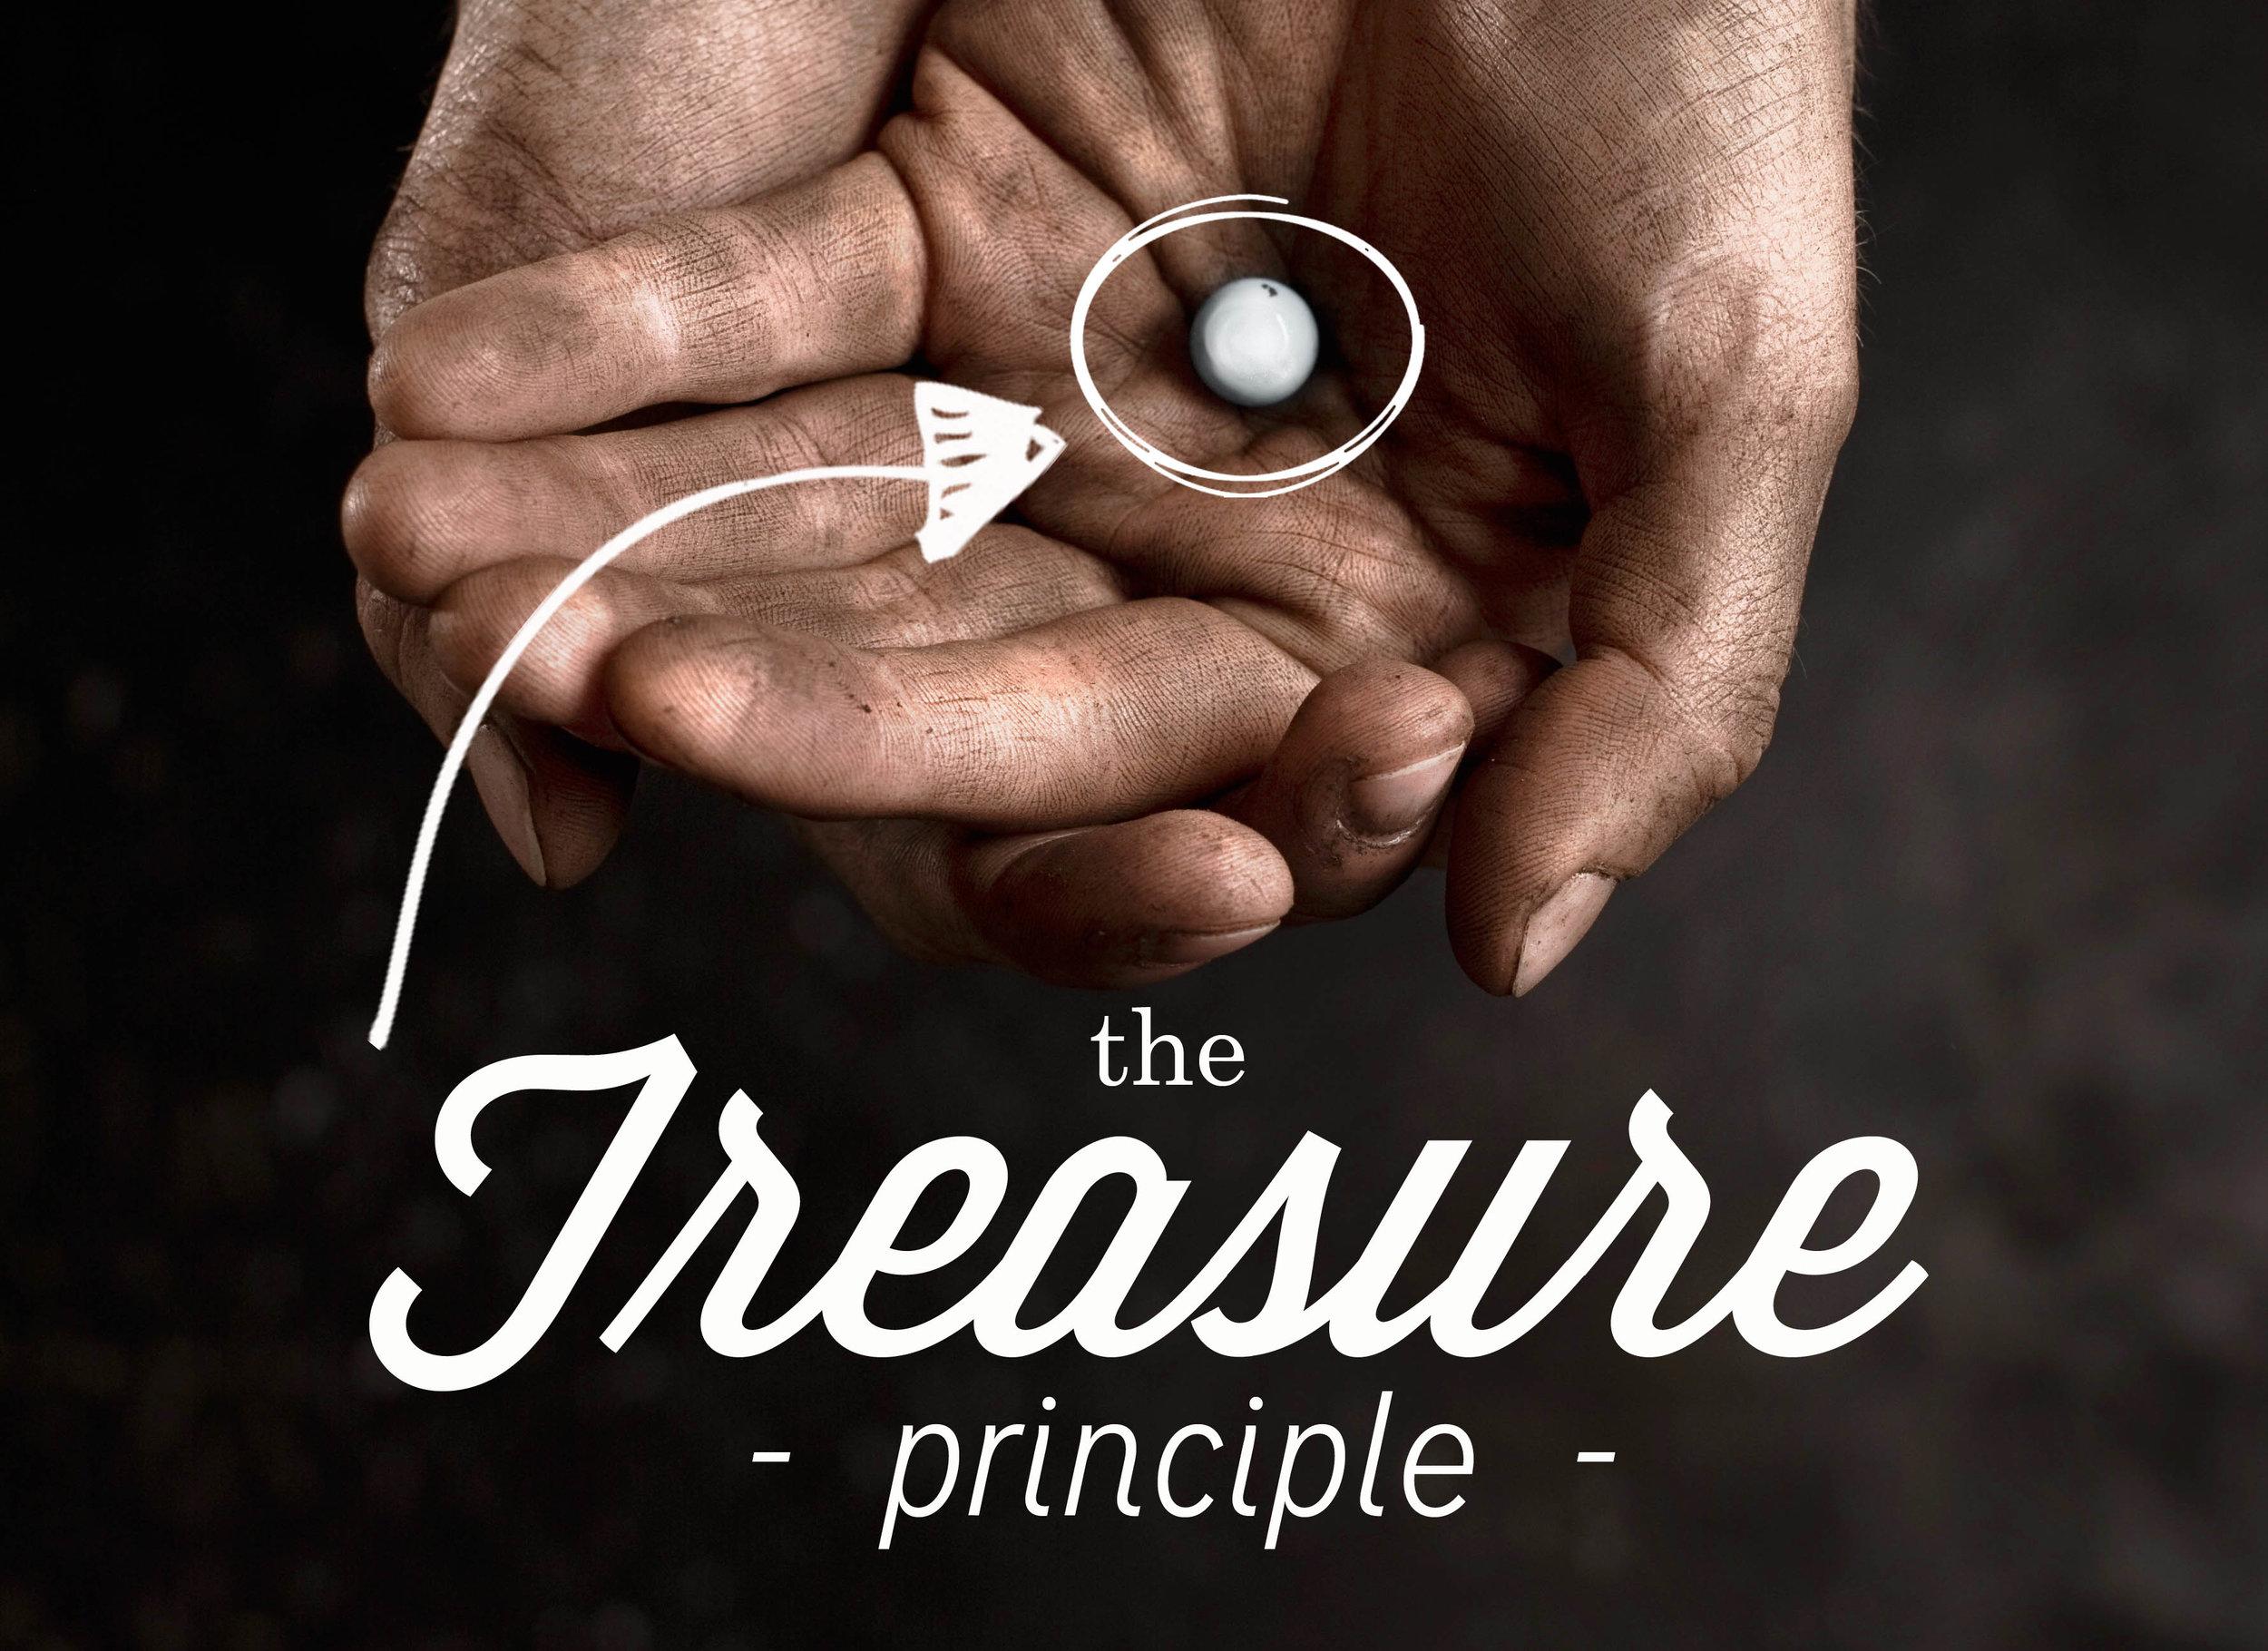 EQUIPPED 2014: The Treasure Principle Study